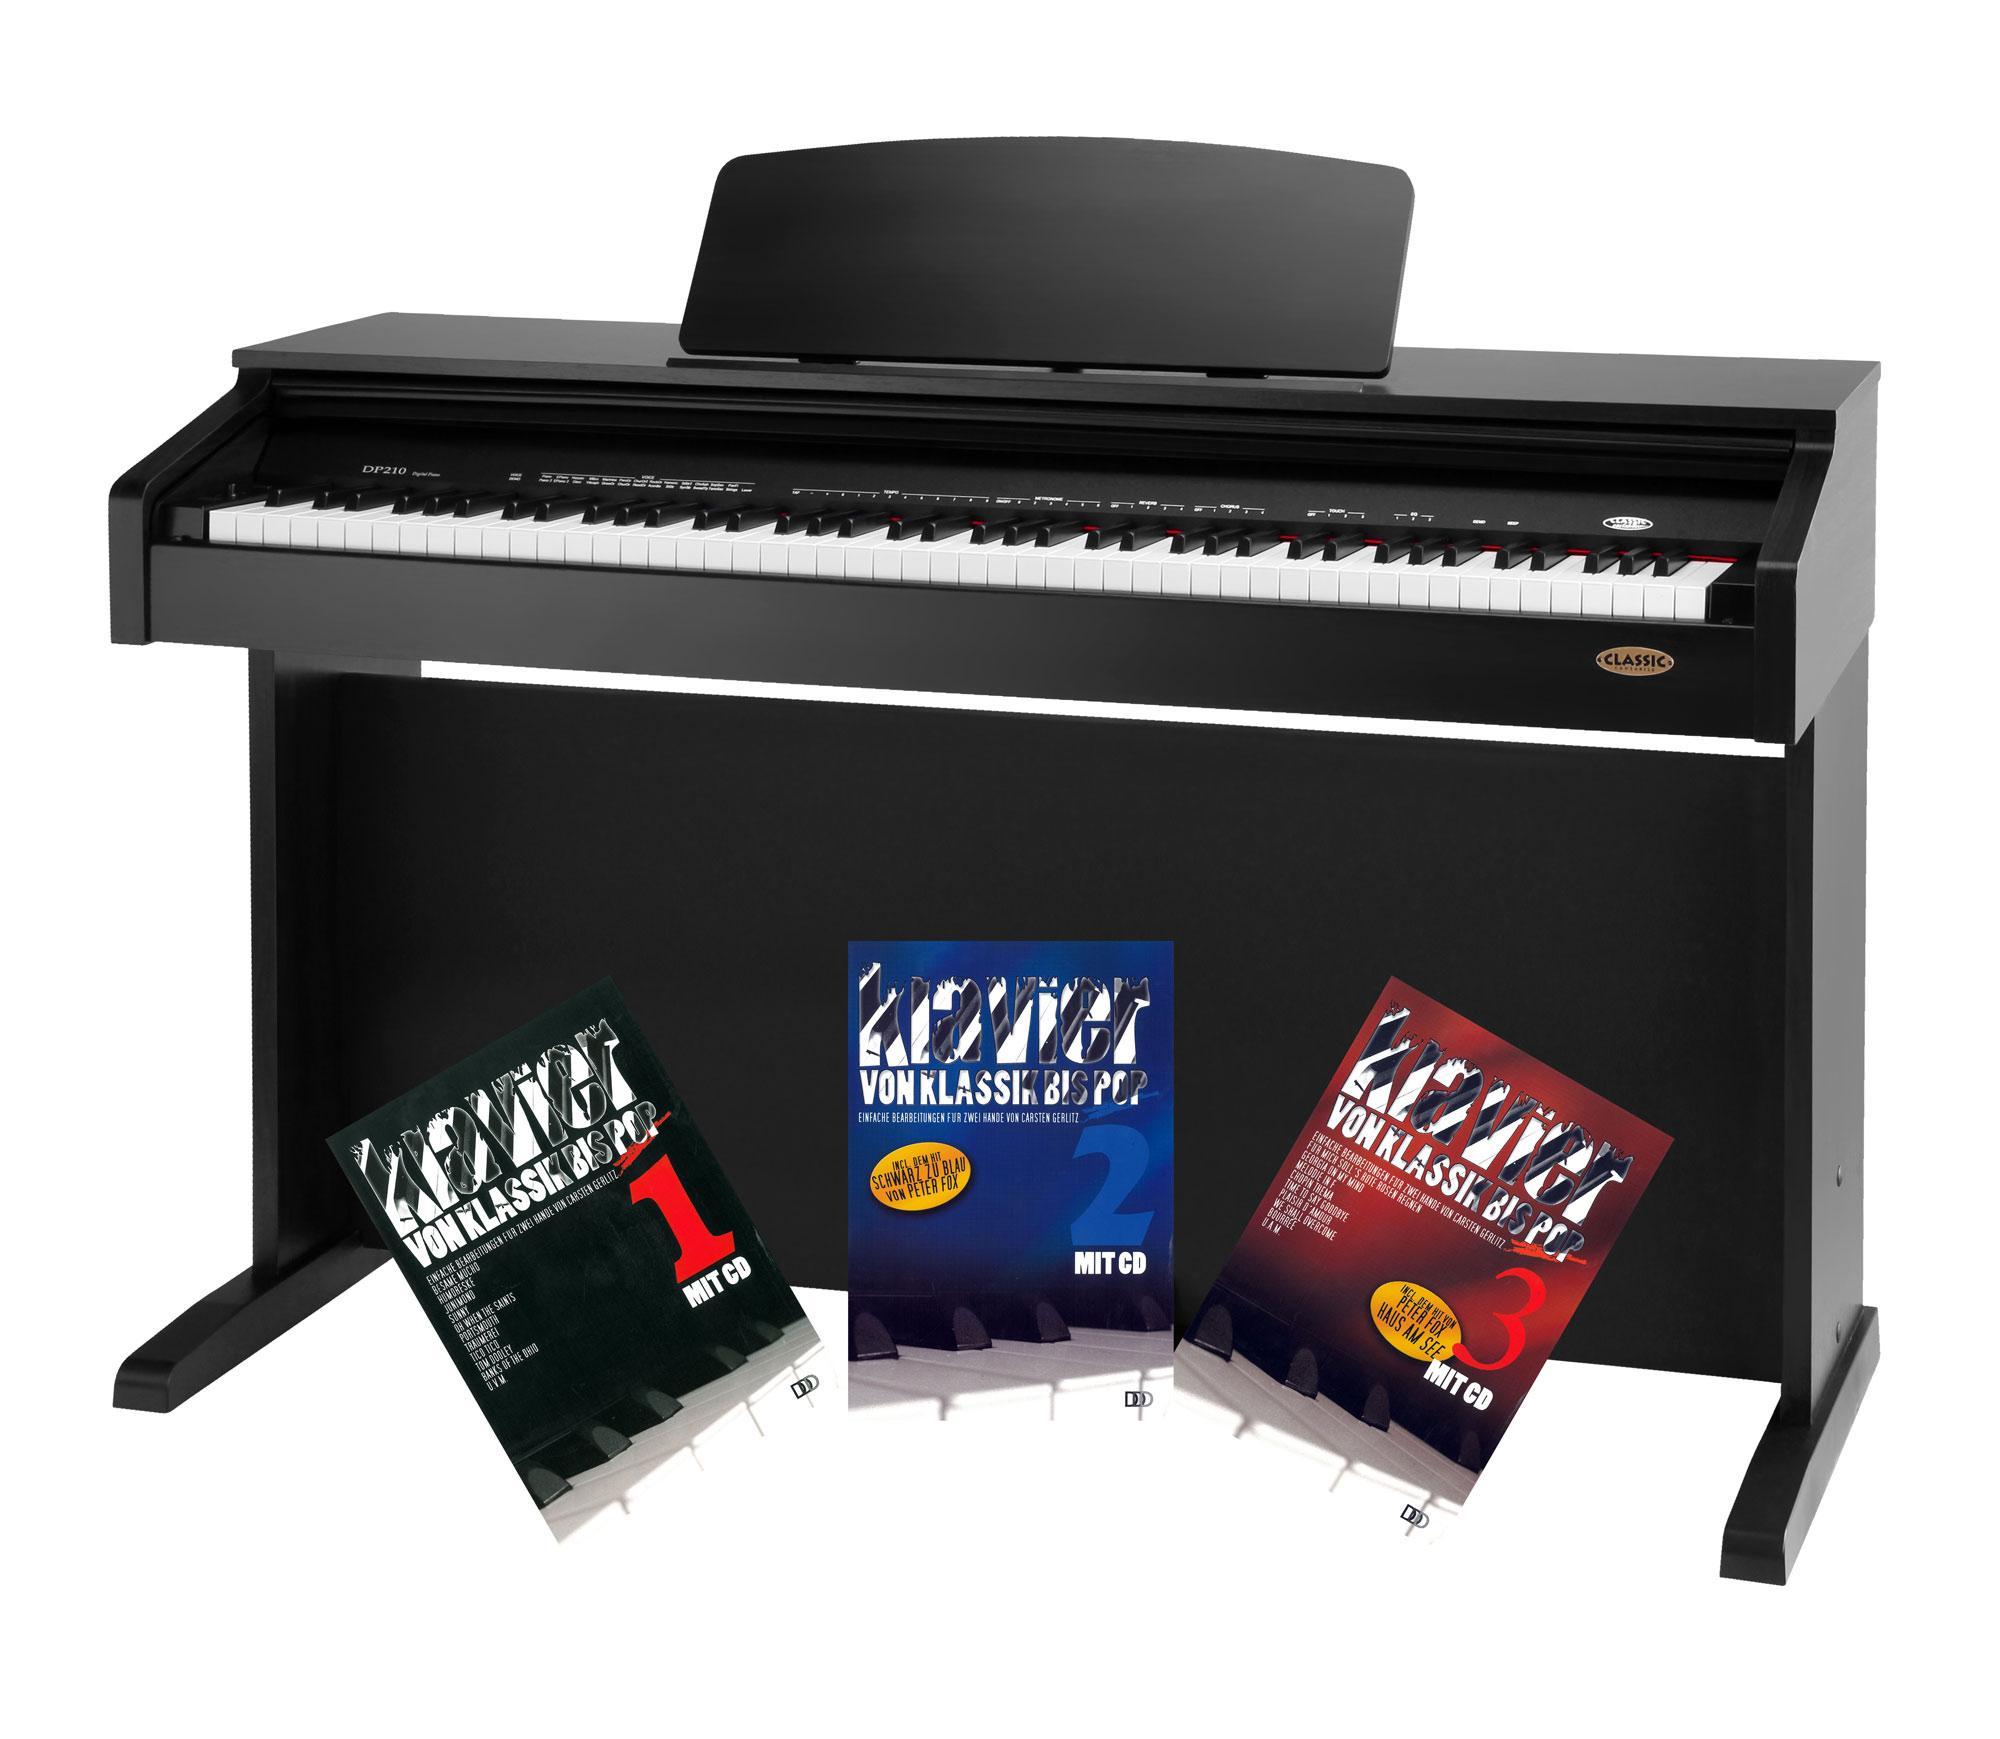 Classic Cantabile DP 210 SM E Piano schwarz matt mit Notenheft